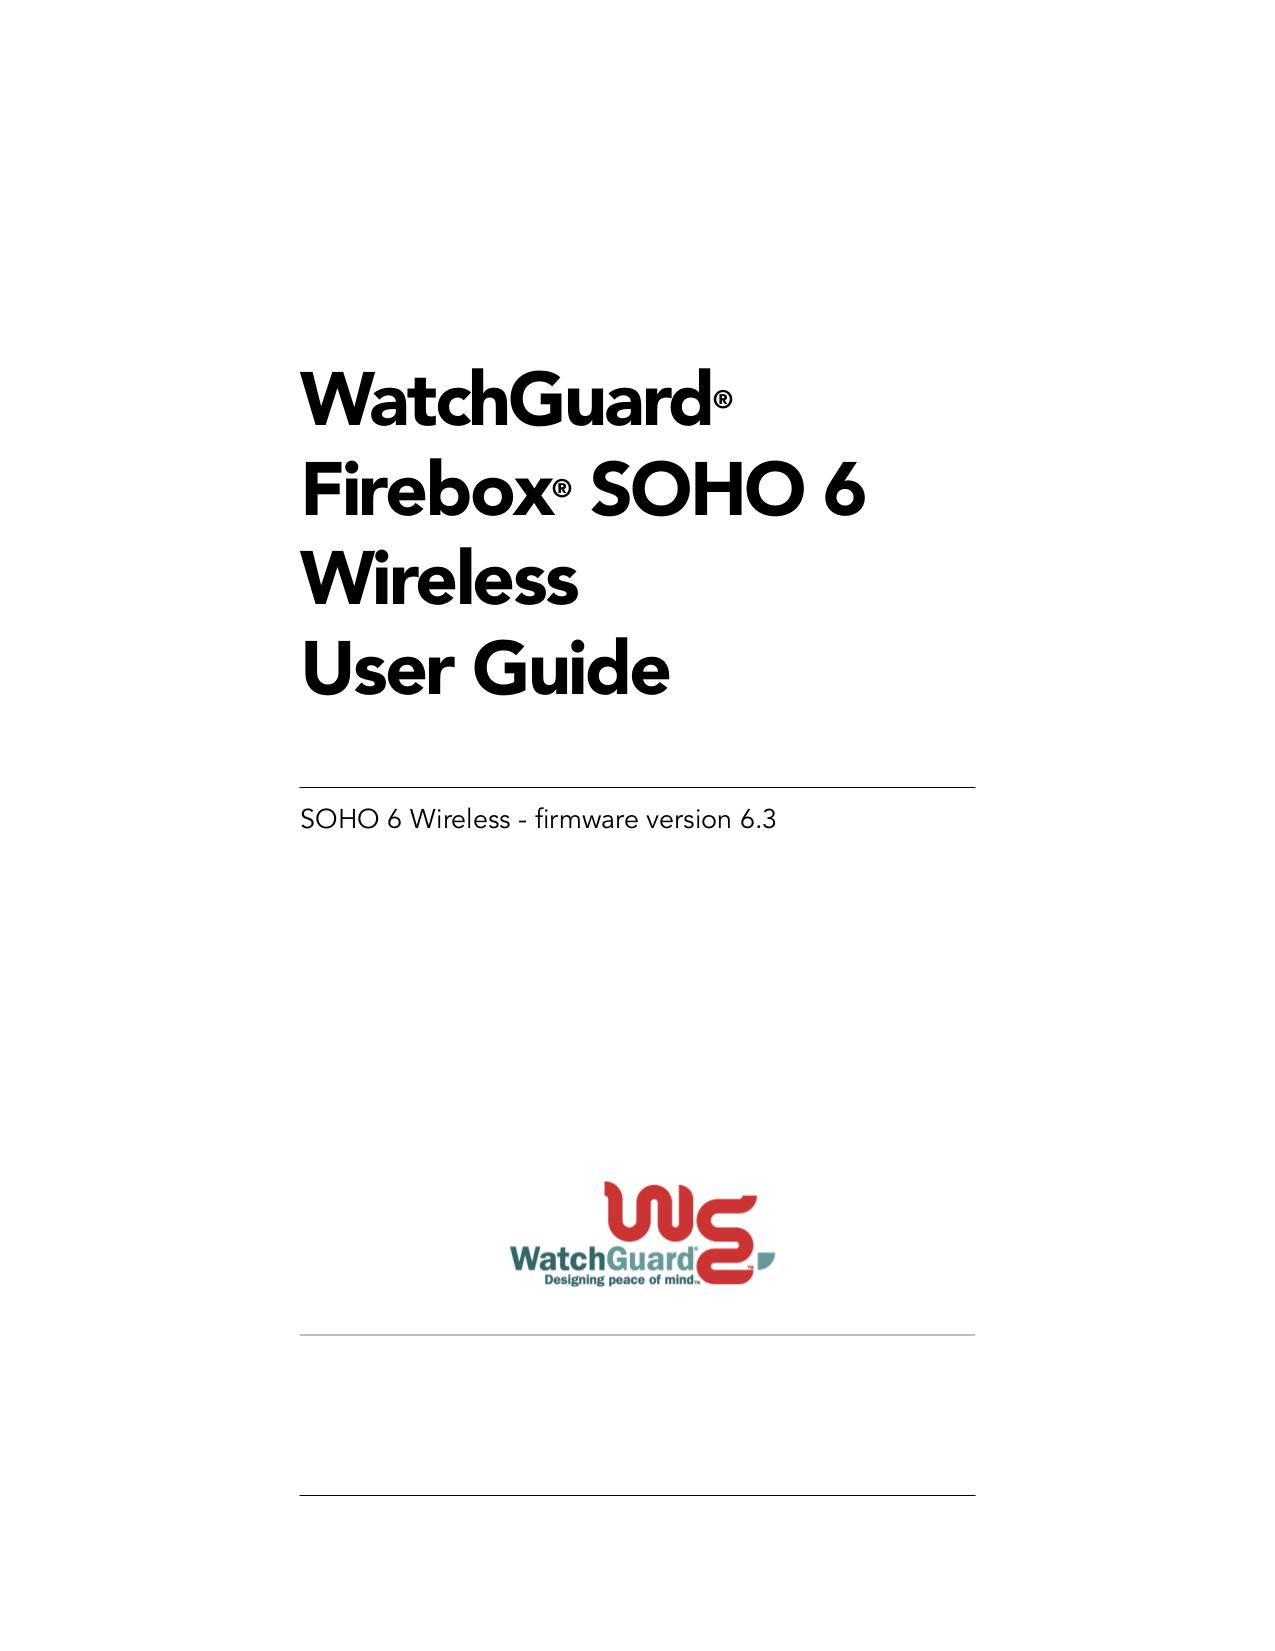 Download free pdf for Watchguard Firebox SOHO Firewall